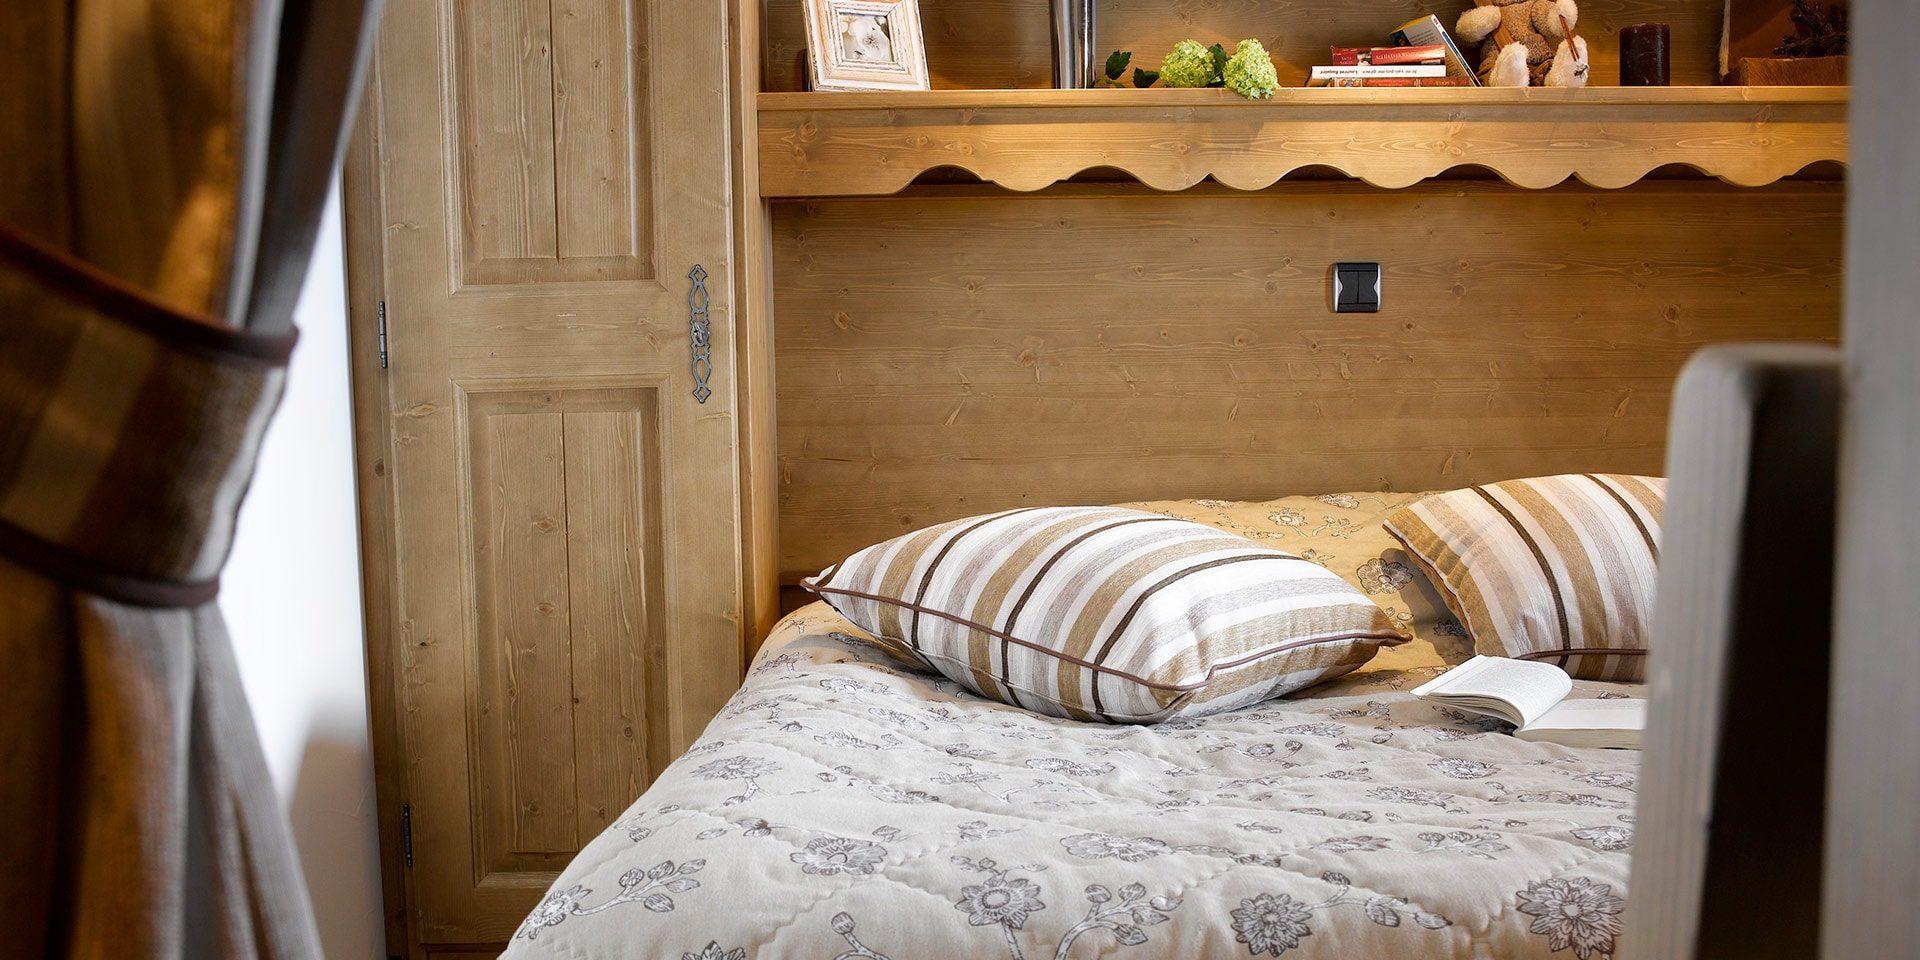 CGH Oree des Cimes Vallandry Paradiski Frankrijk wintersport skivakantie luxe slaapkamer bed comfortabel lekker slapen hout authentiek modern